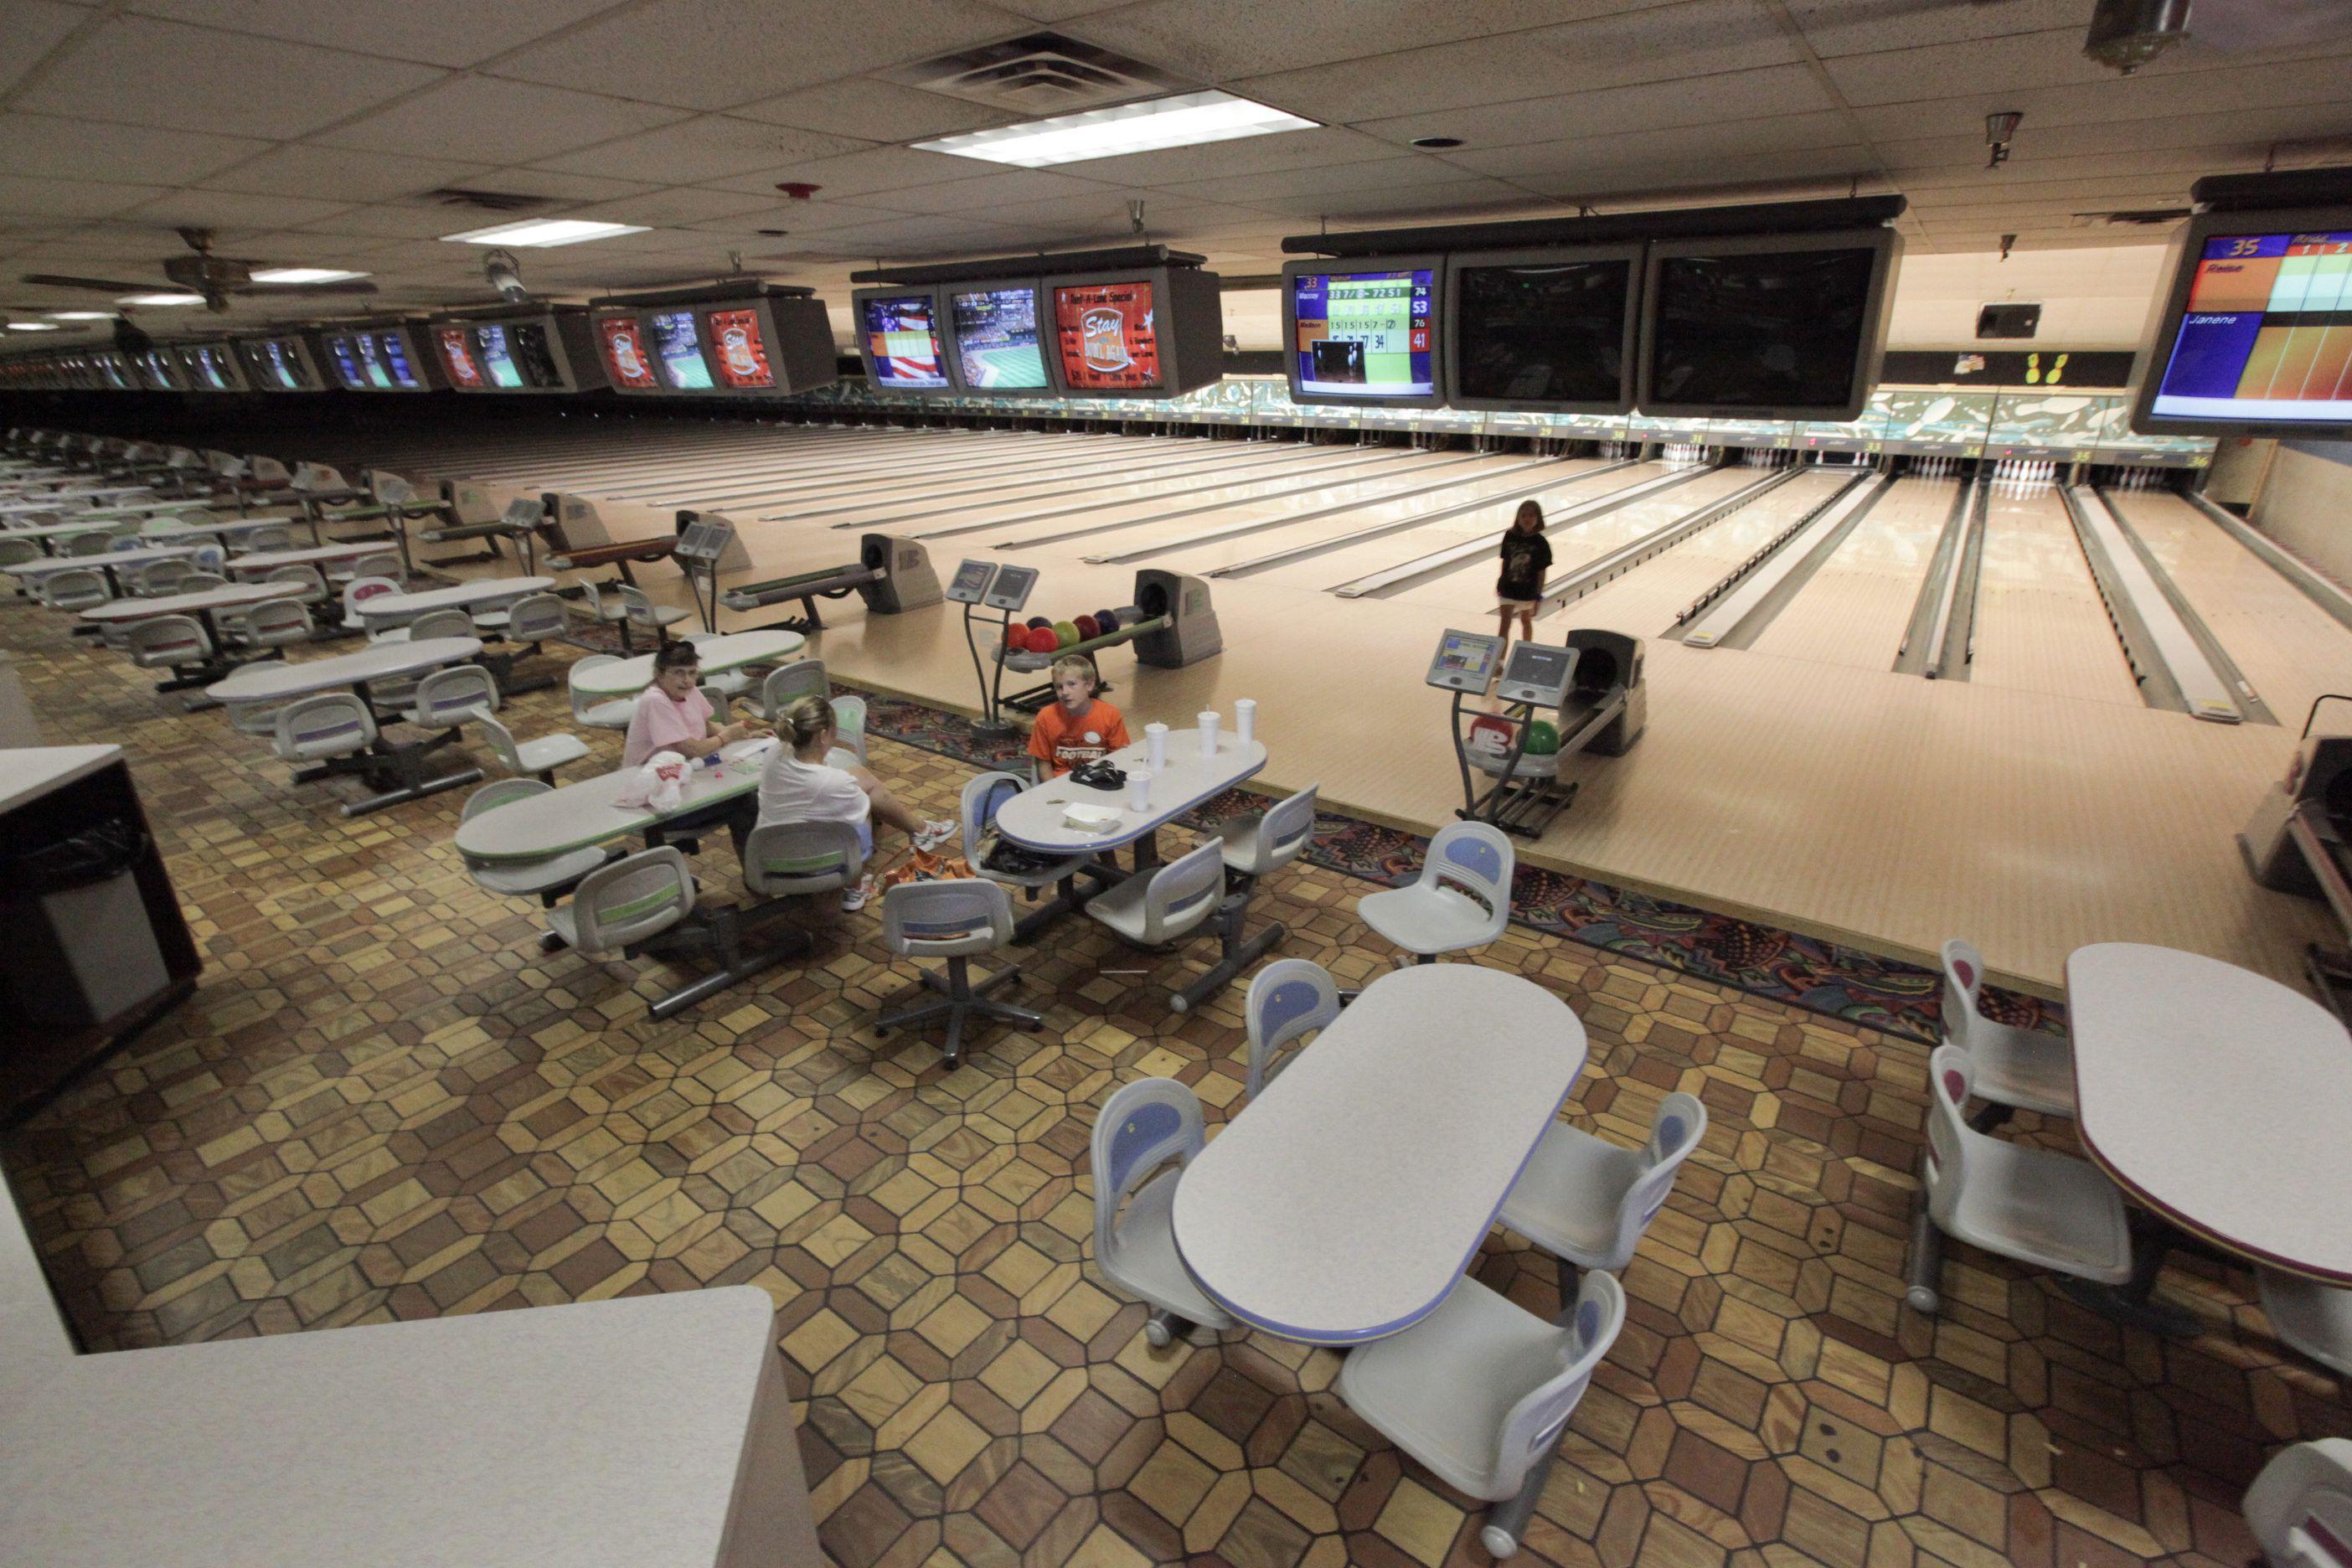 The Big Apple Family Fun Center in Kearney, Nebraska has